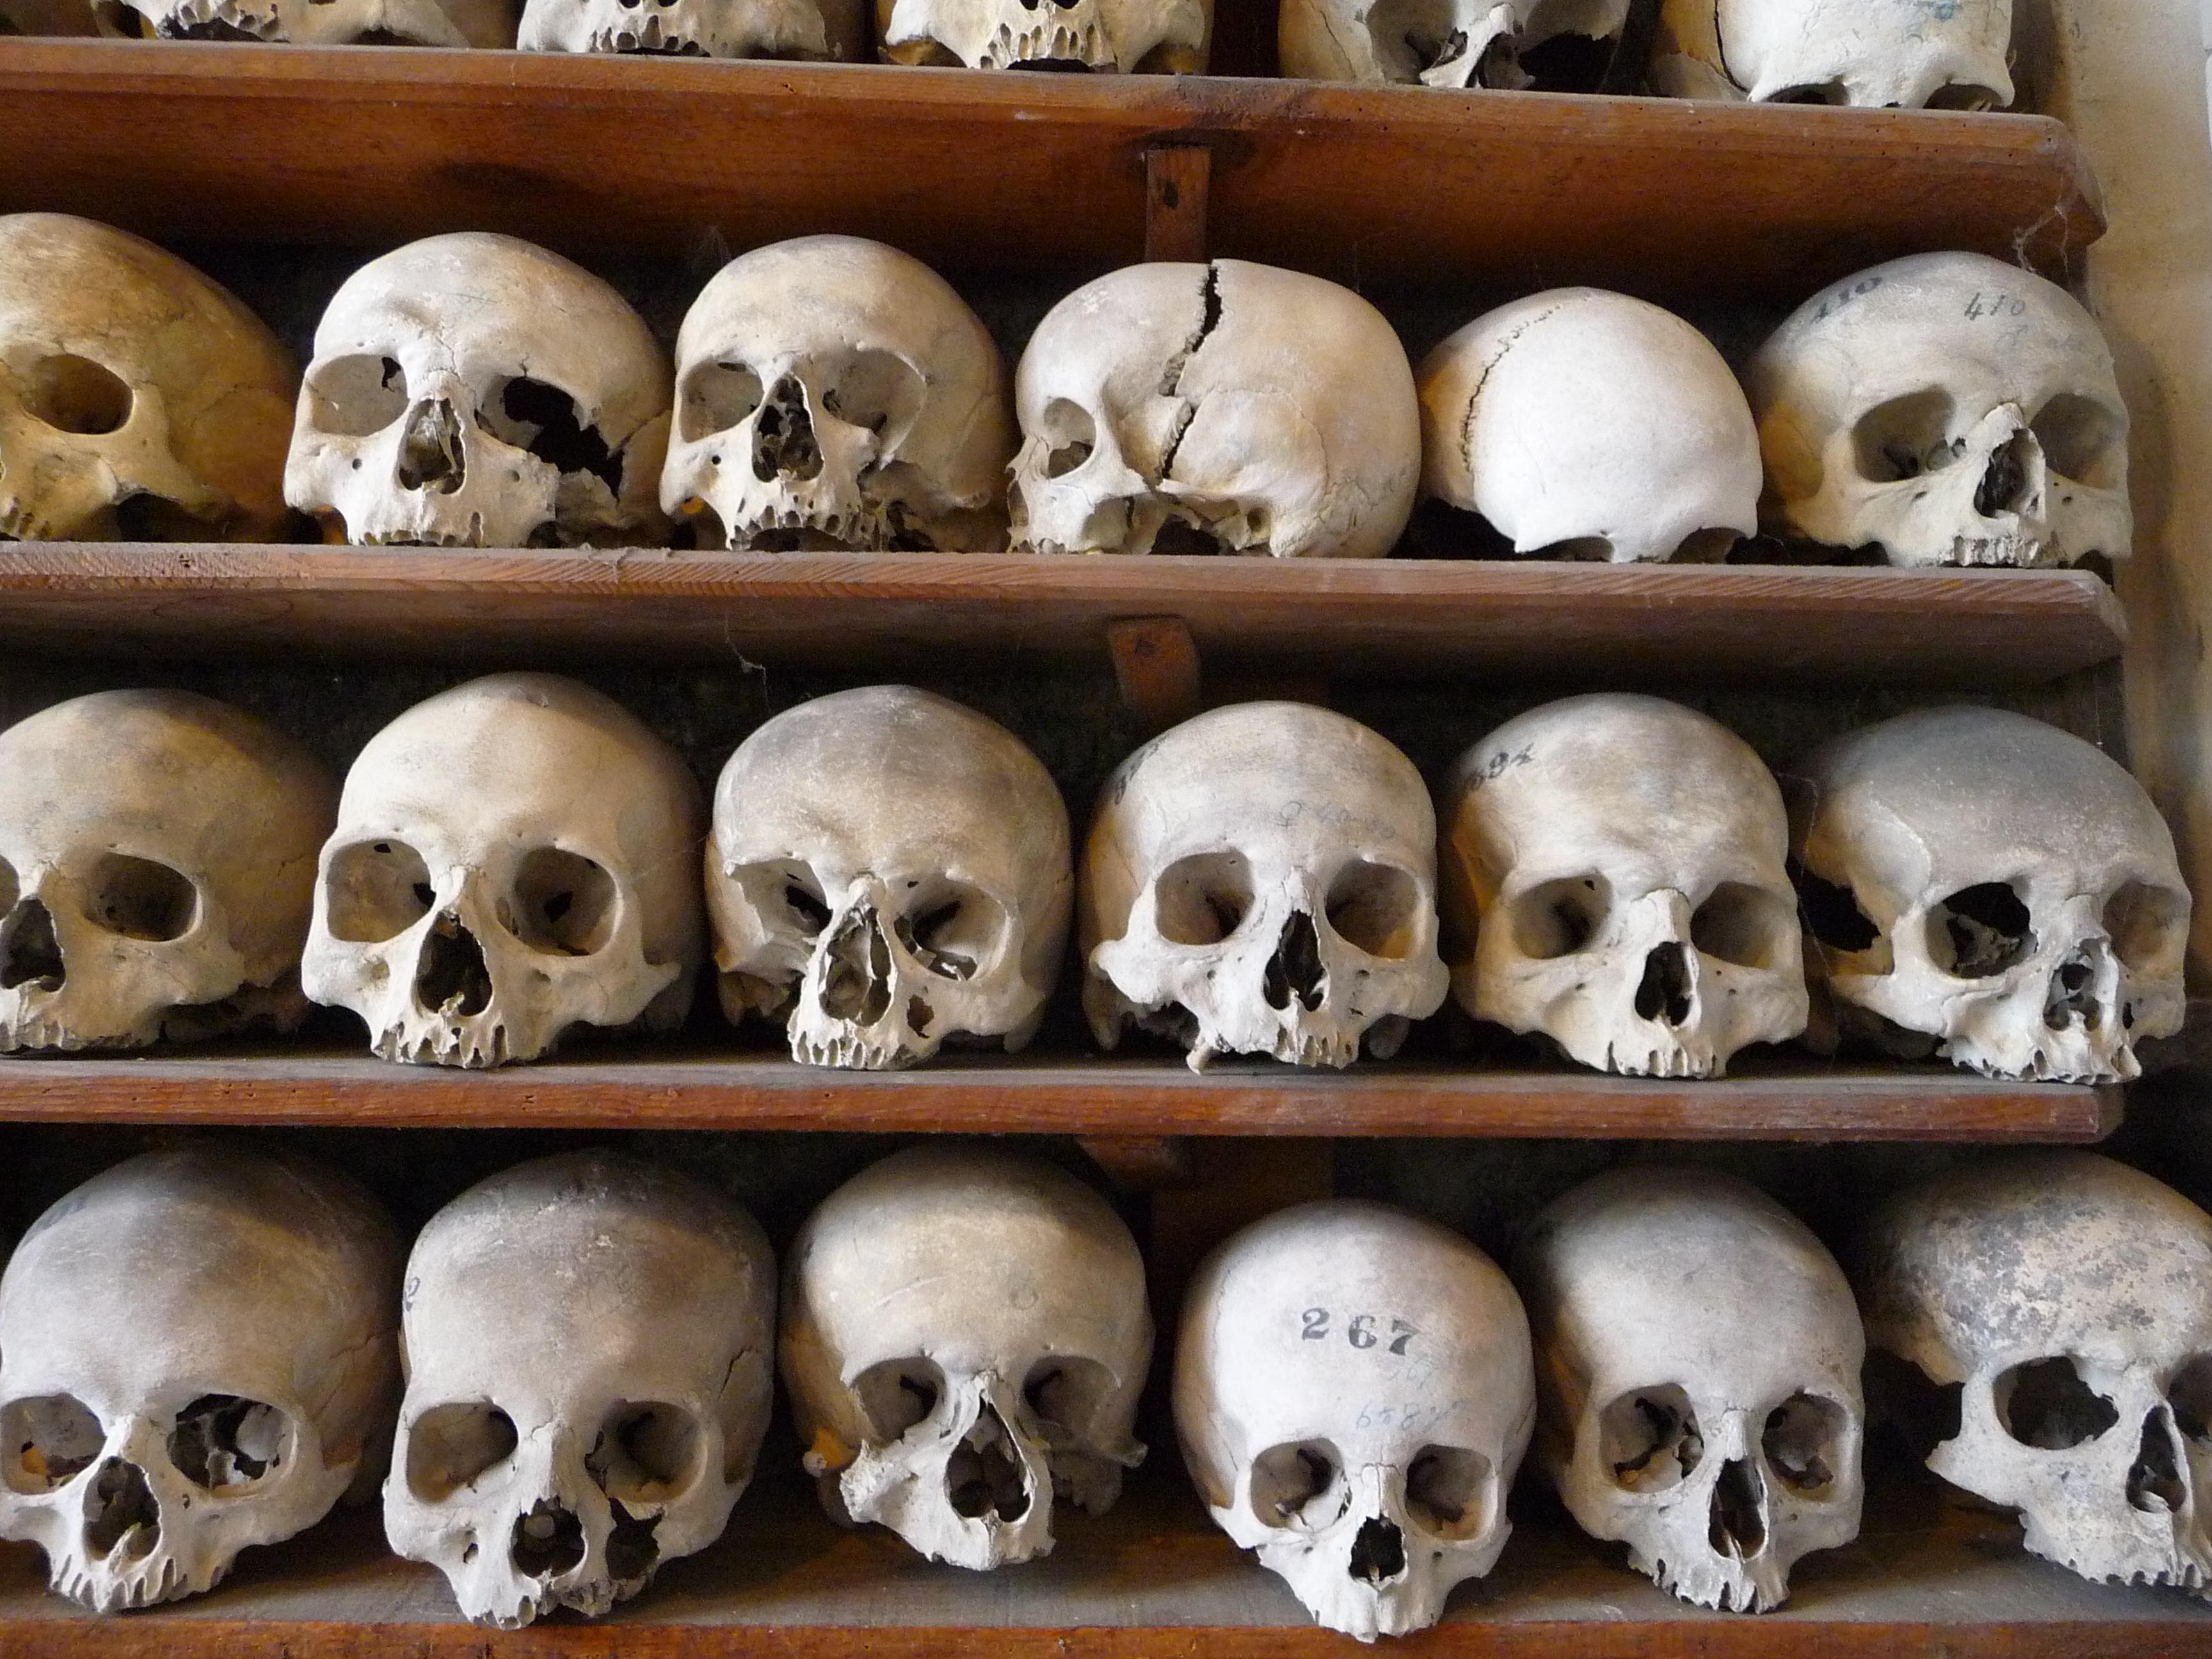 Skulls on a shelf